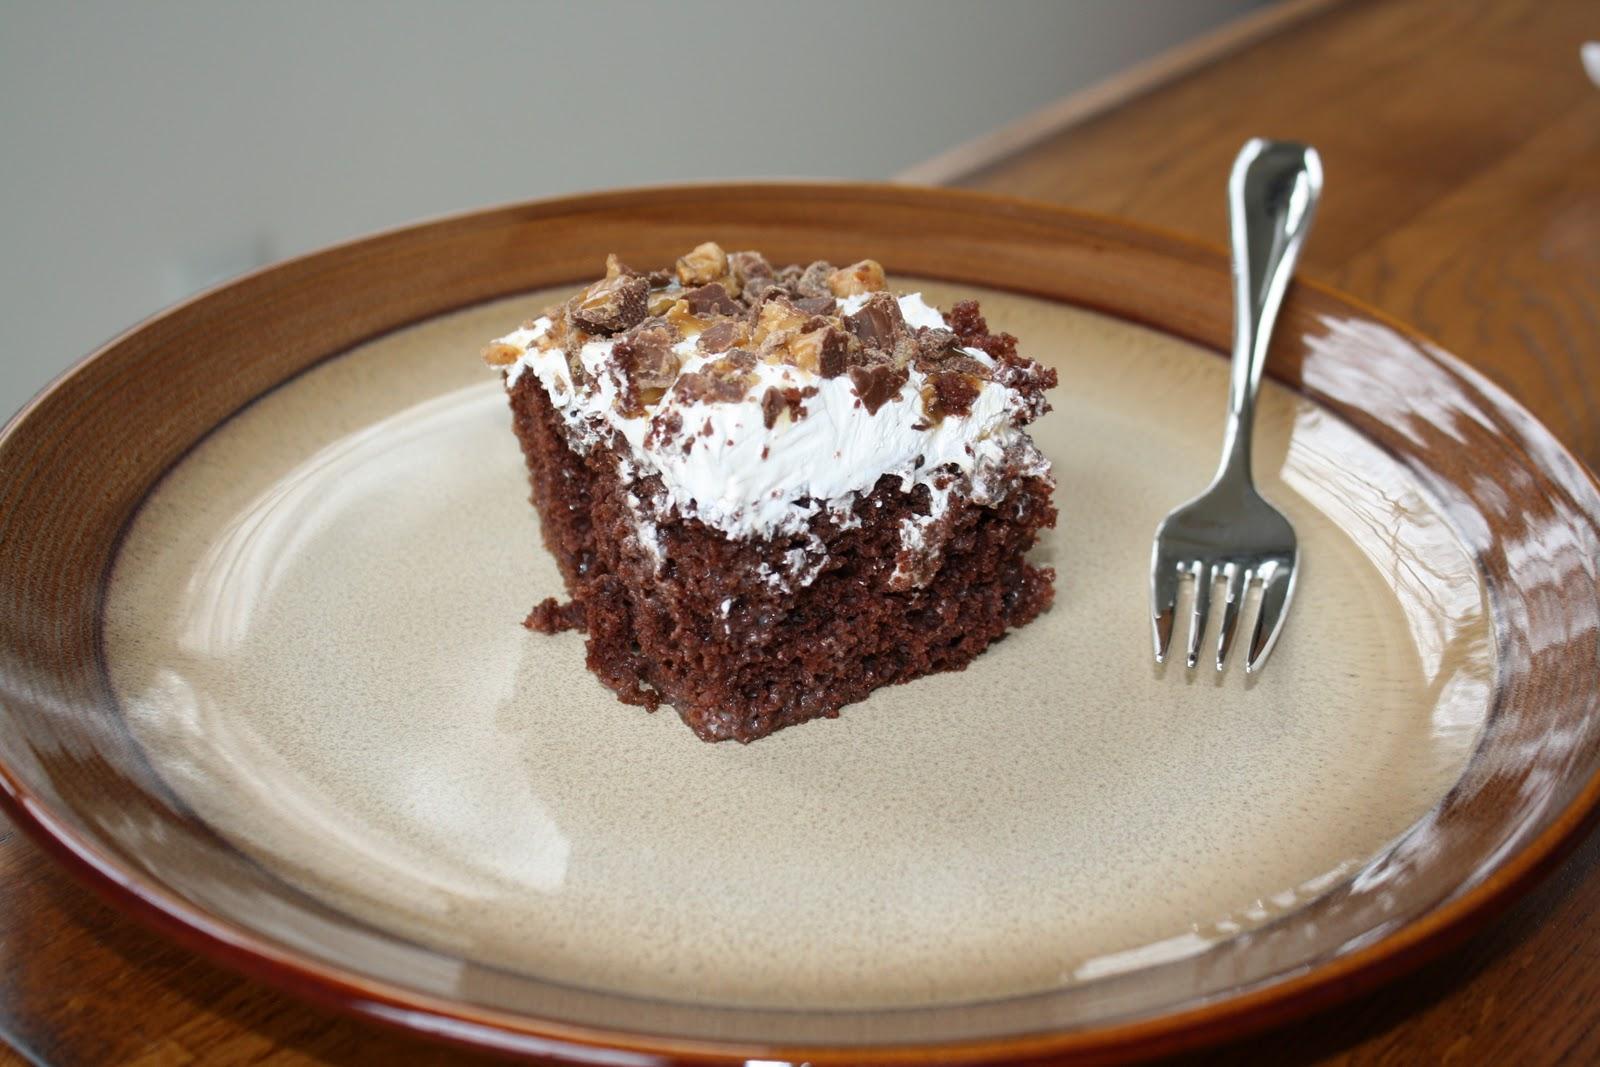 Better Than Sex Cake - Sooooo Yummy!